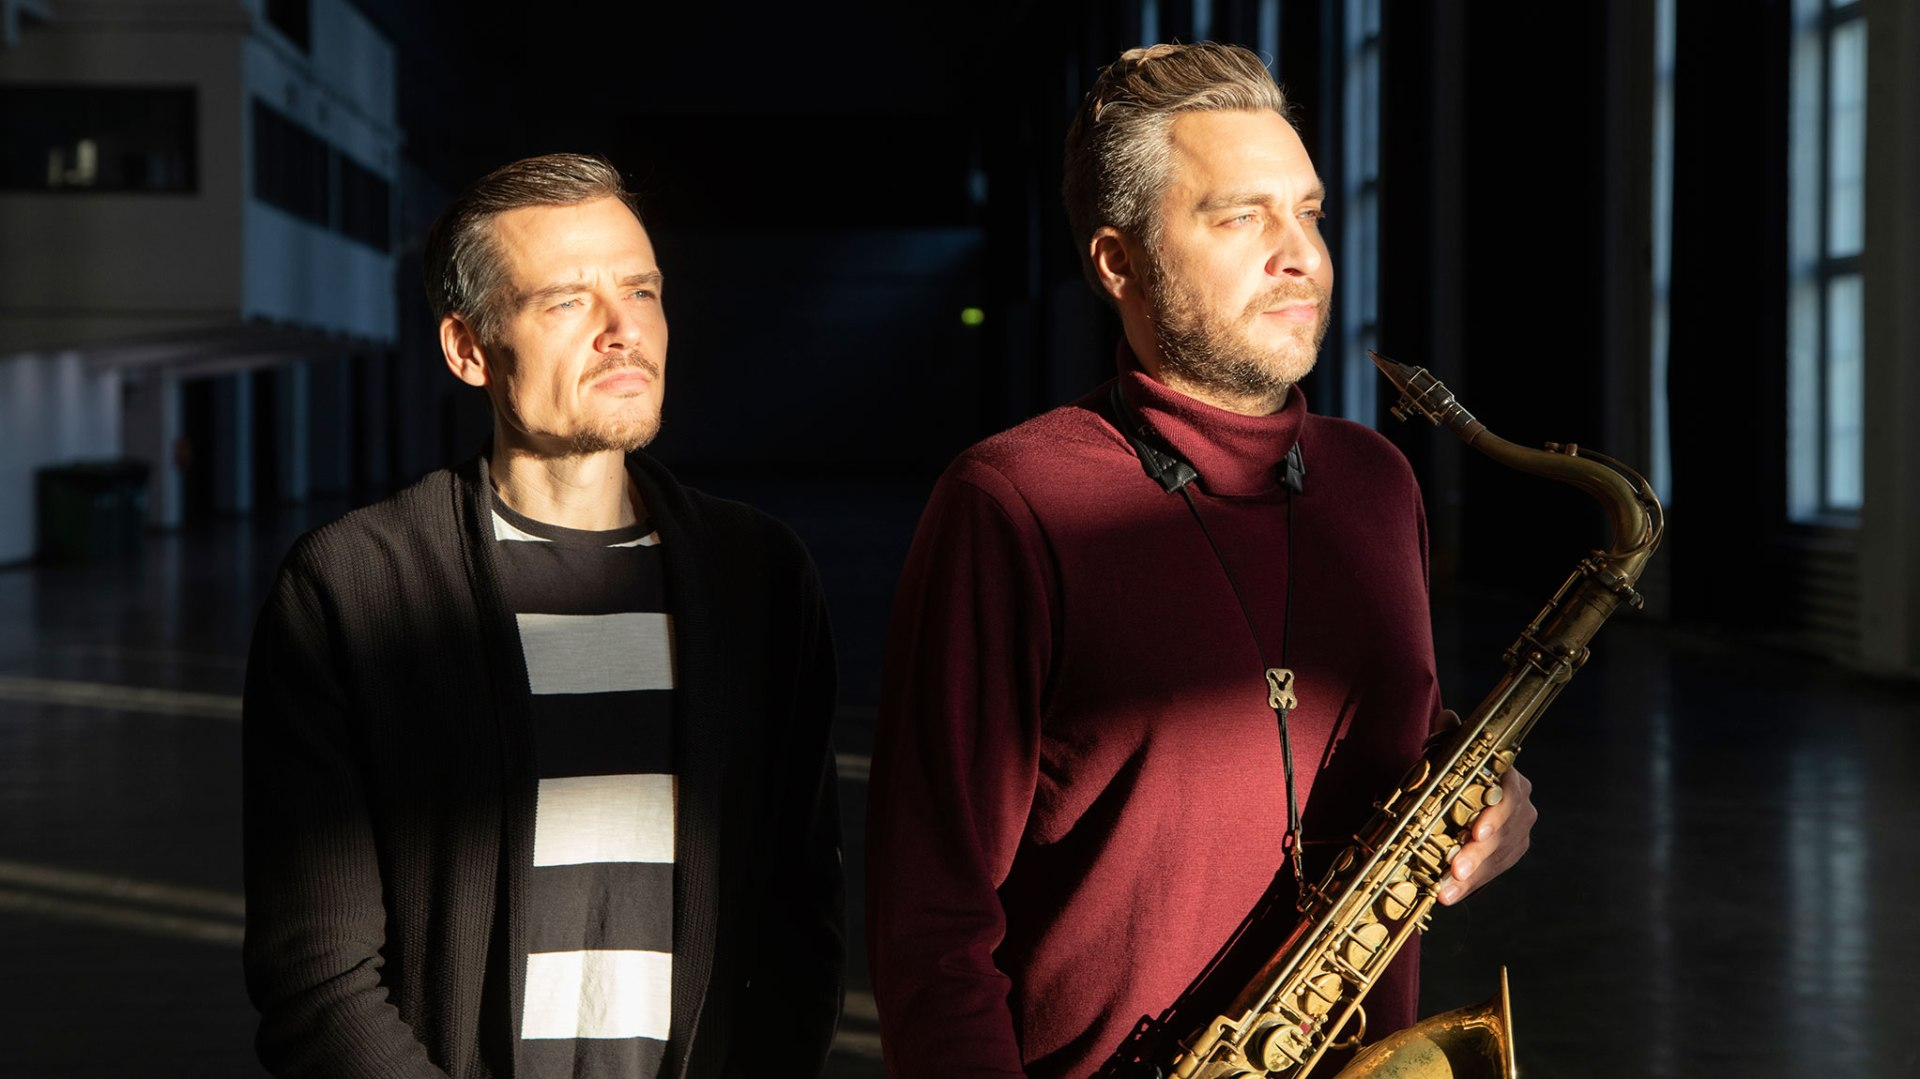 Timo Lassy and Teppo Mäkynen share self-titled album.